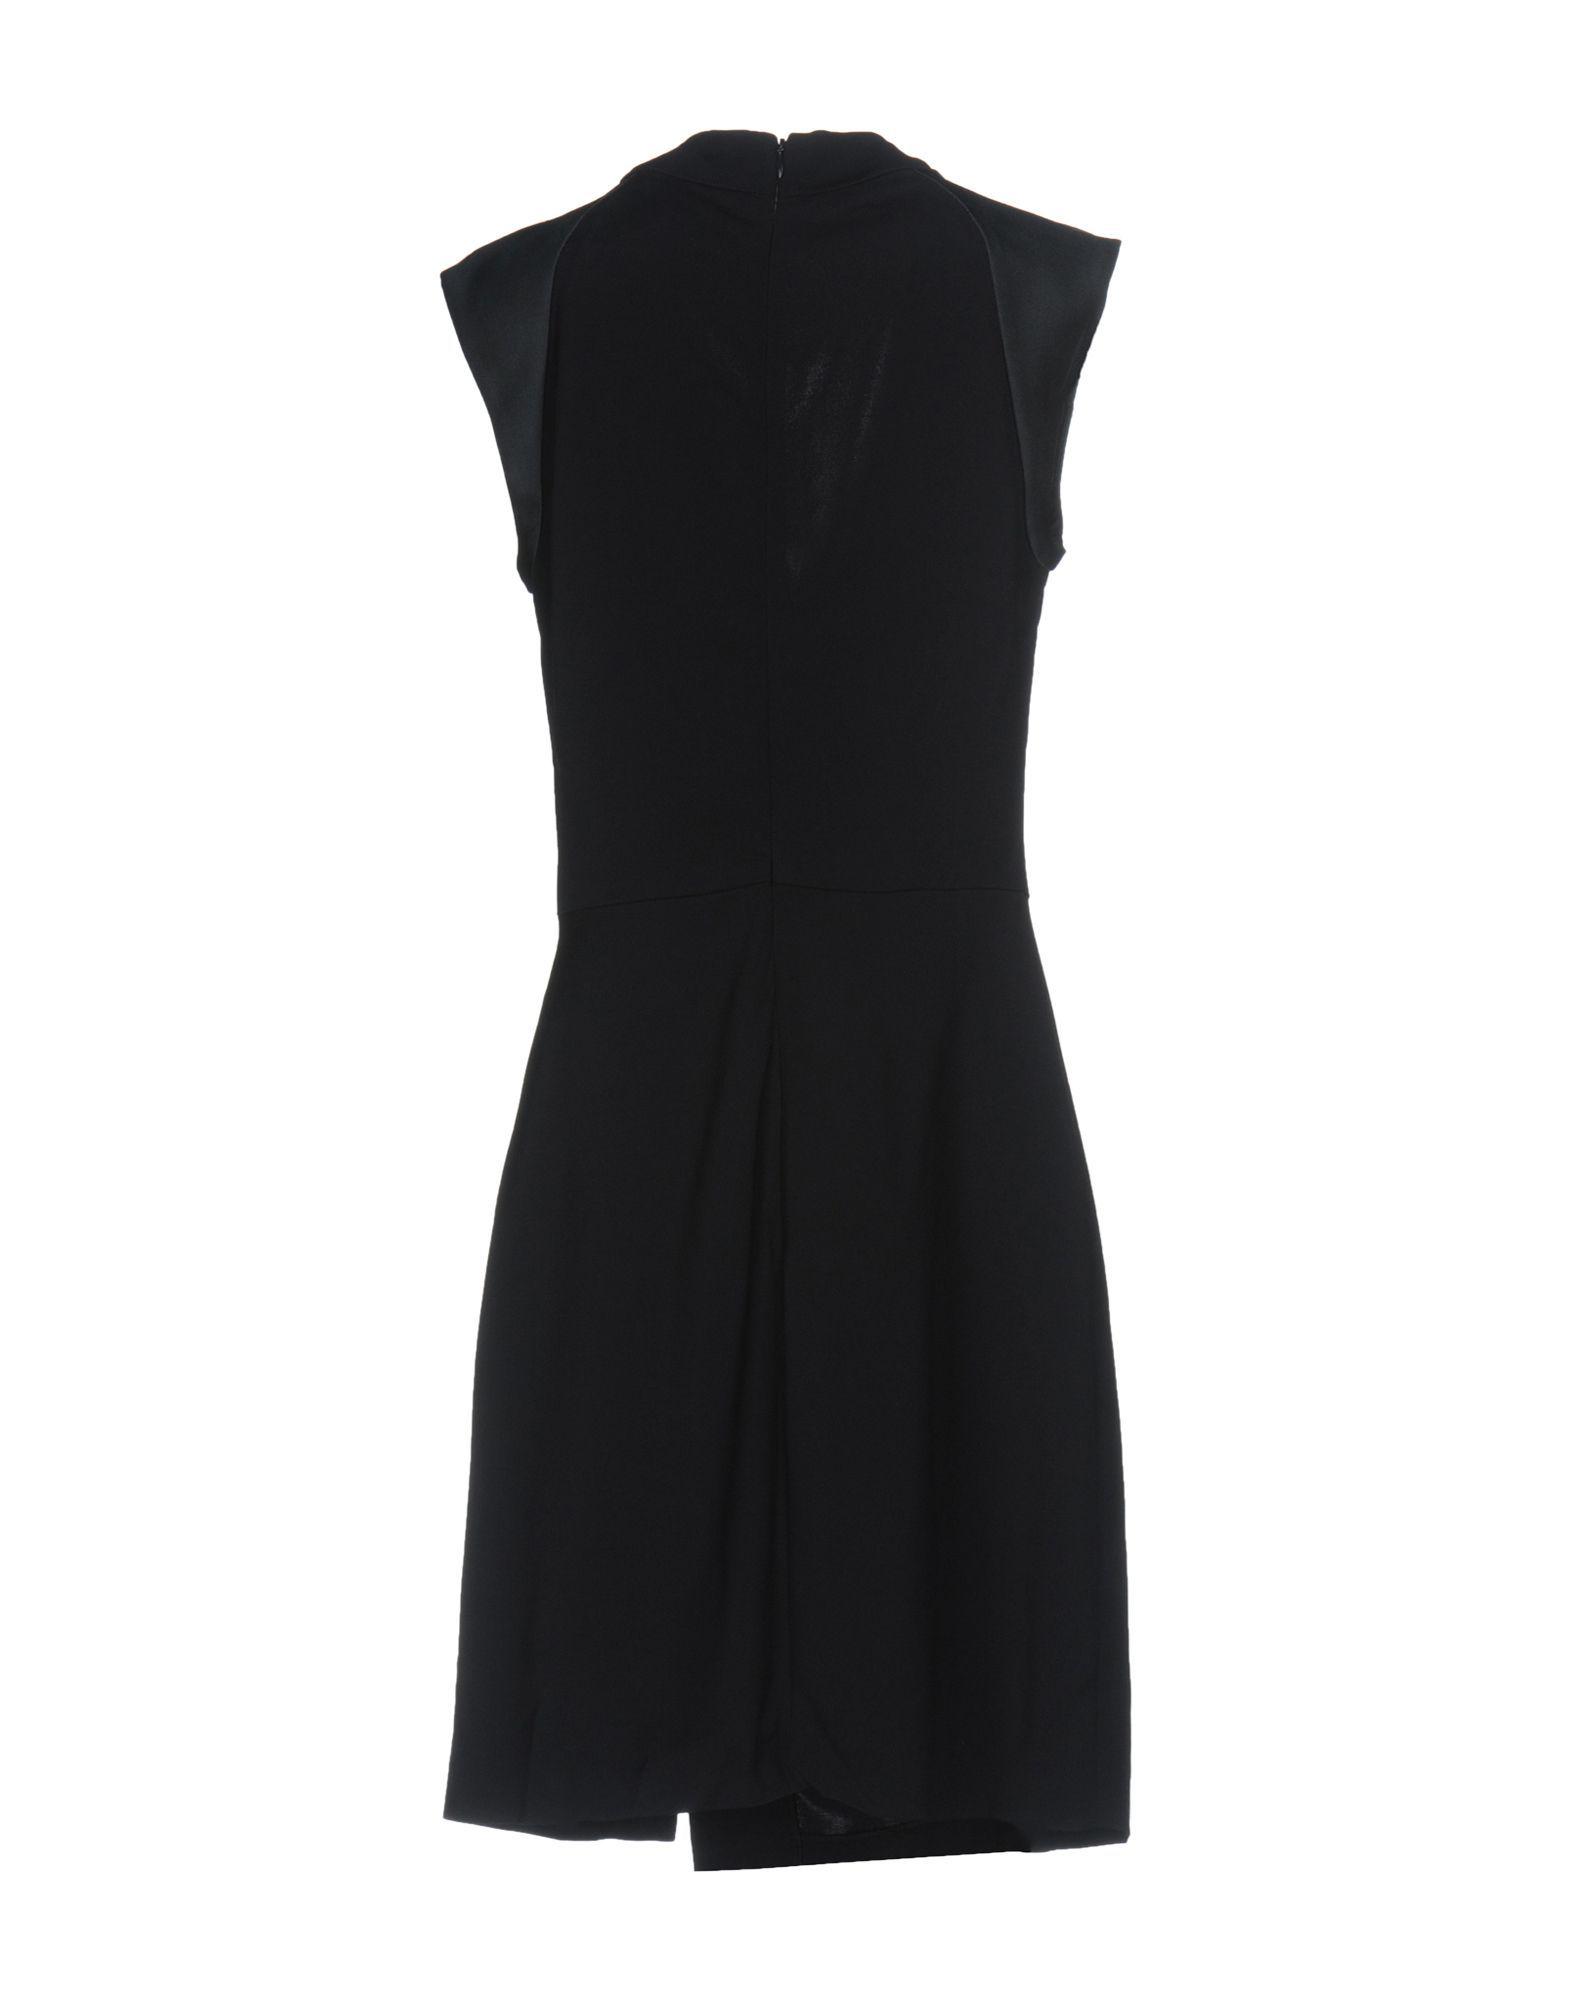 Tara Jarmon Dark Blue Crepe And Satin Sleeveless Dress